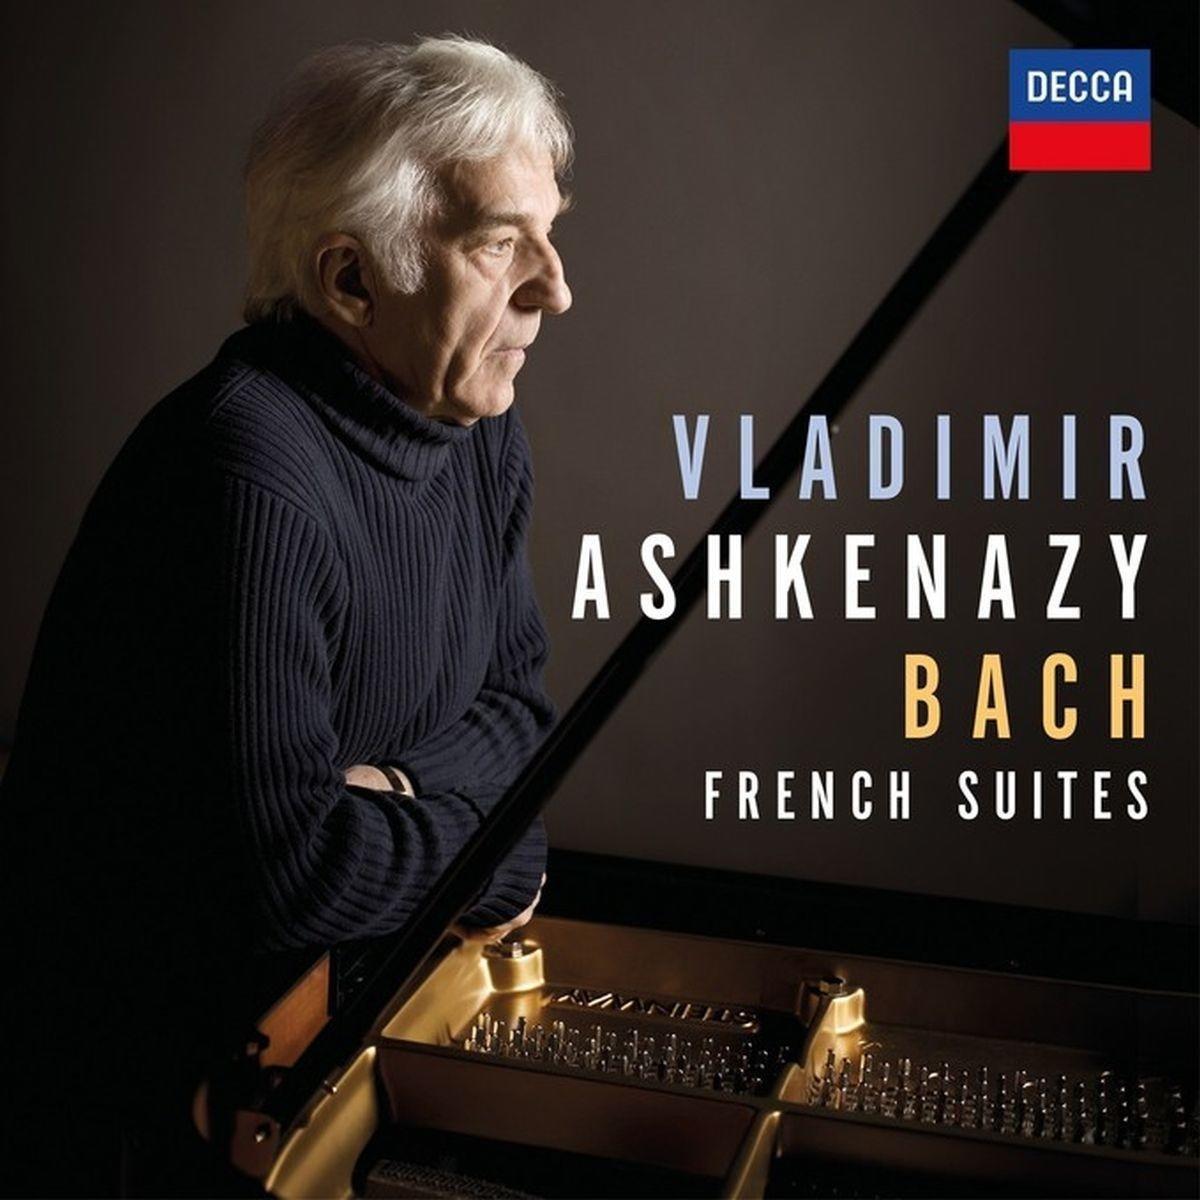 Bach French Suites - Vladimir Ashkenazy